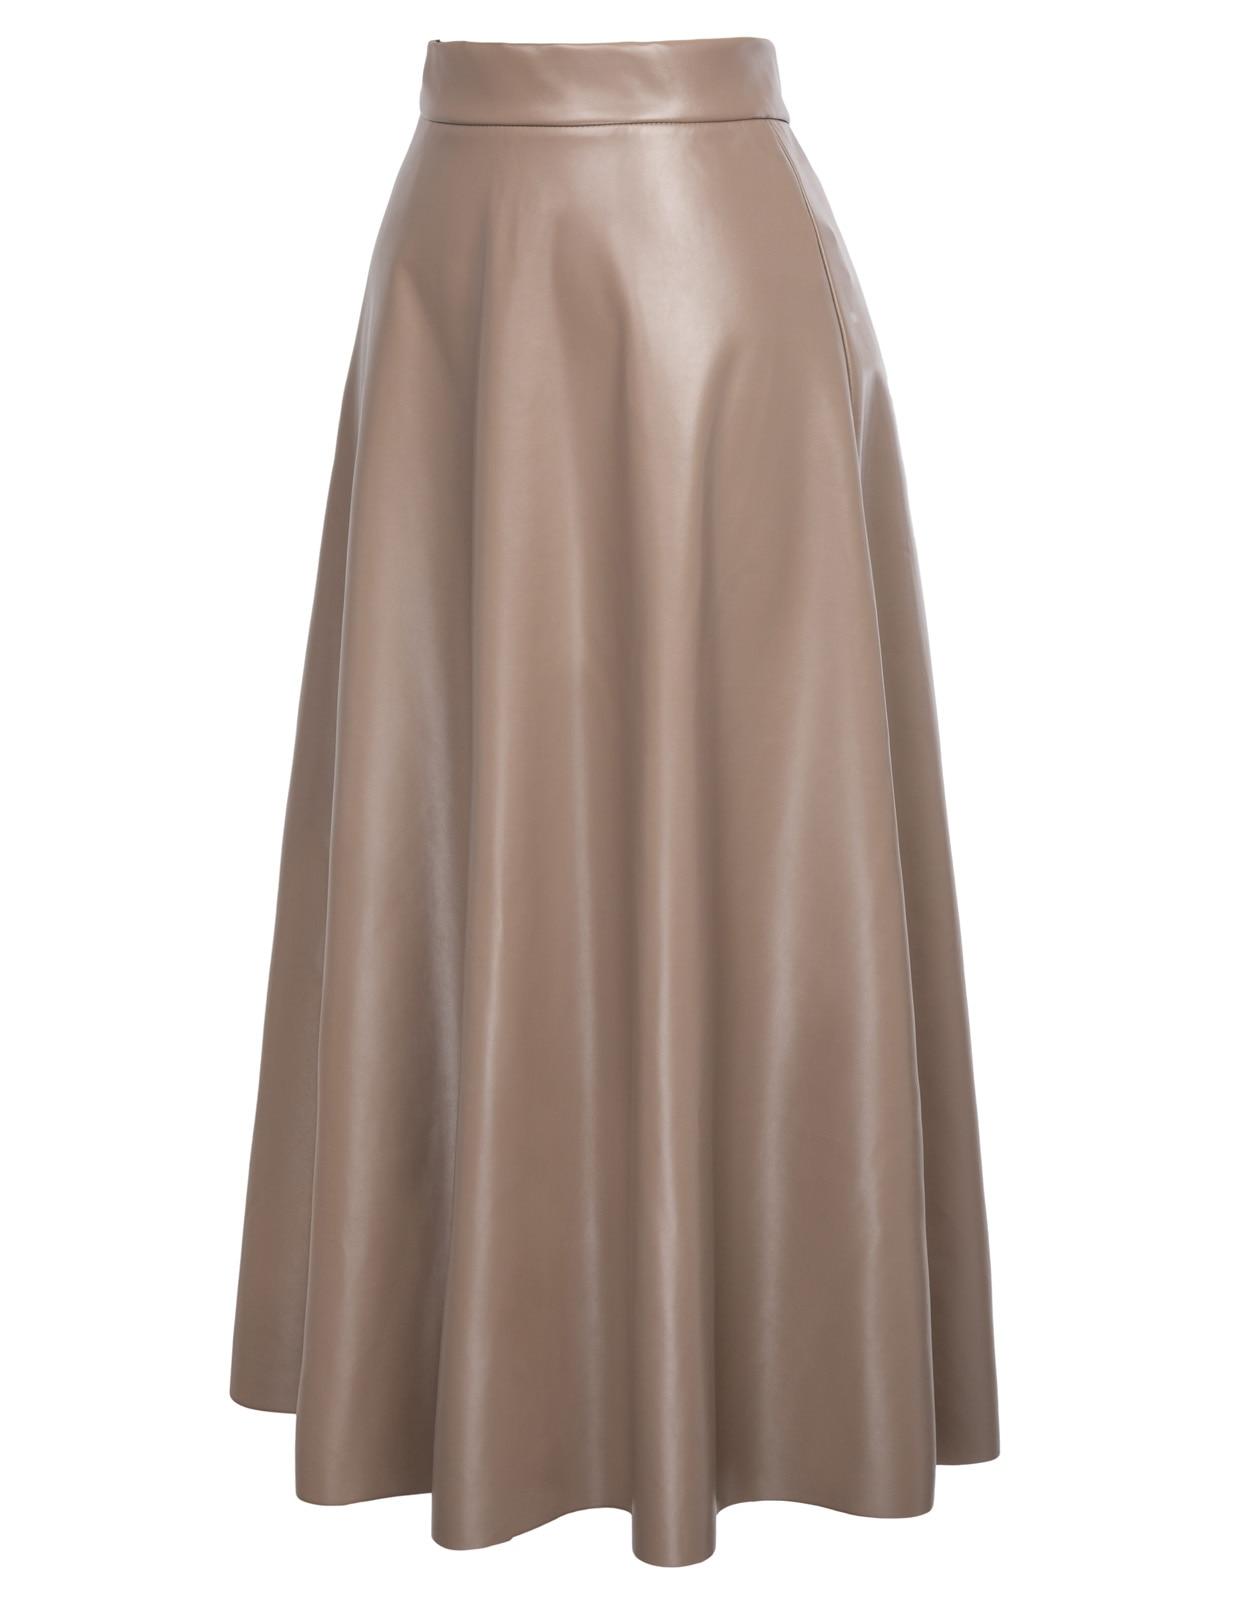 2018 Autumn Winter Women Skirt Fashion PU Leather Solid Long Skirt High Waist Pleated Swing Vintage Maxi Skirt Saias XL